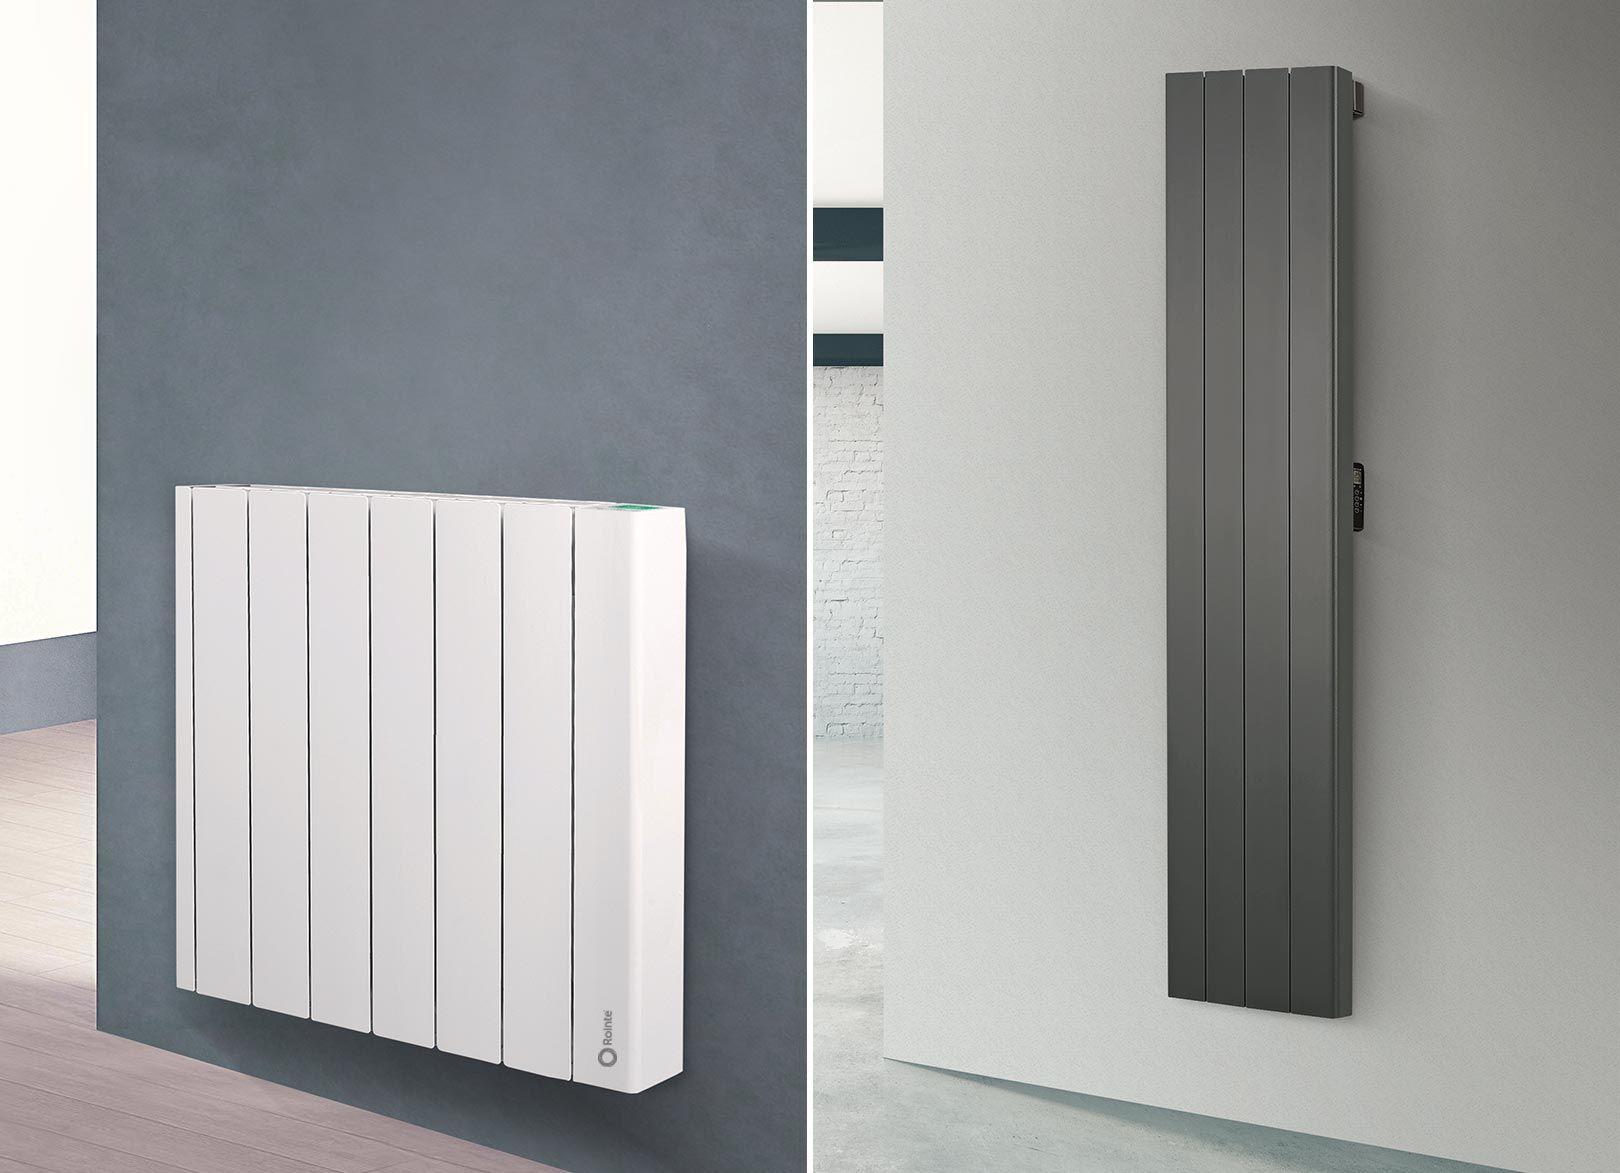 Rointe heating presents its new range of electric radiators